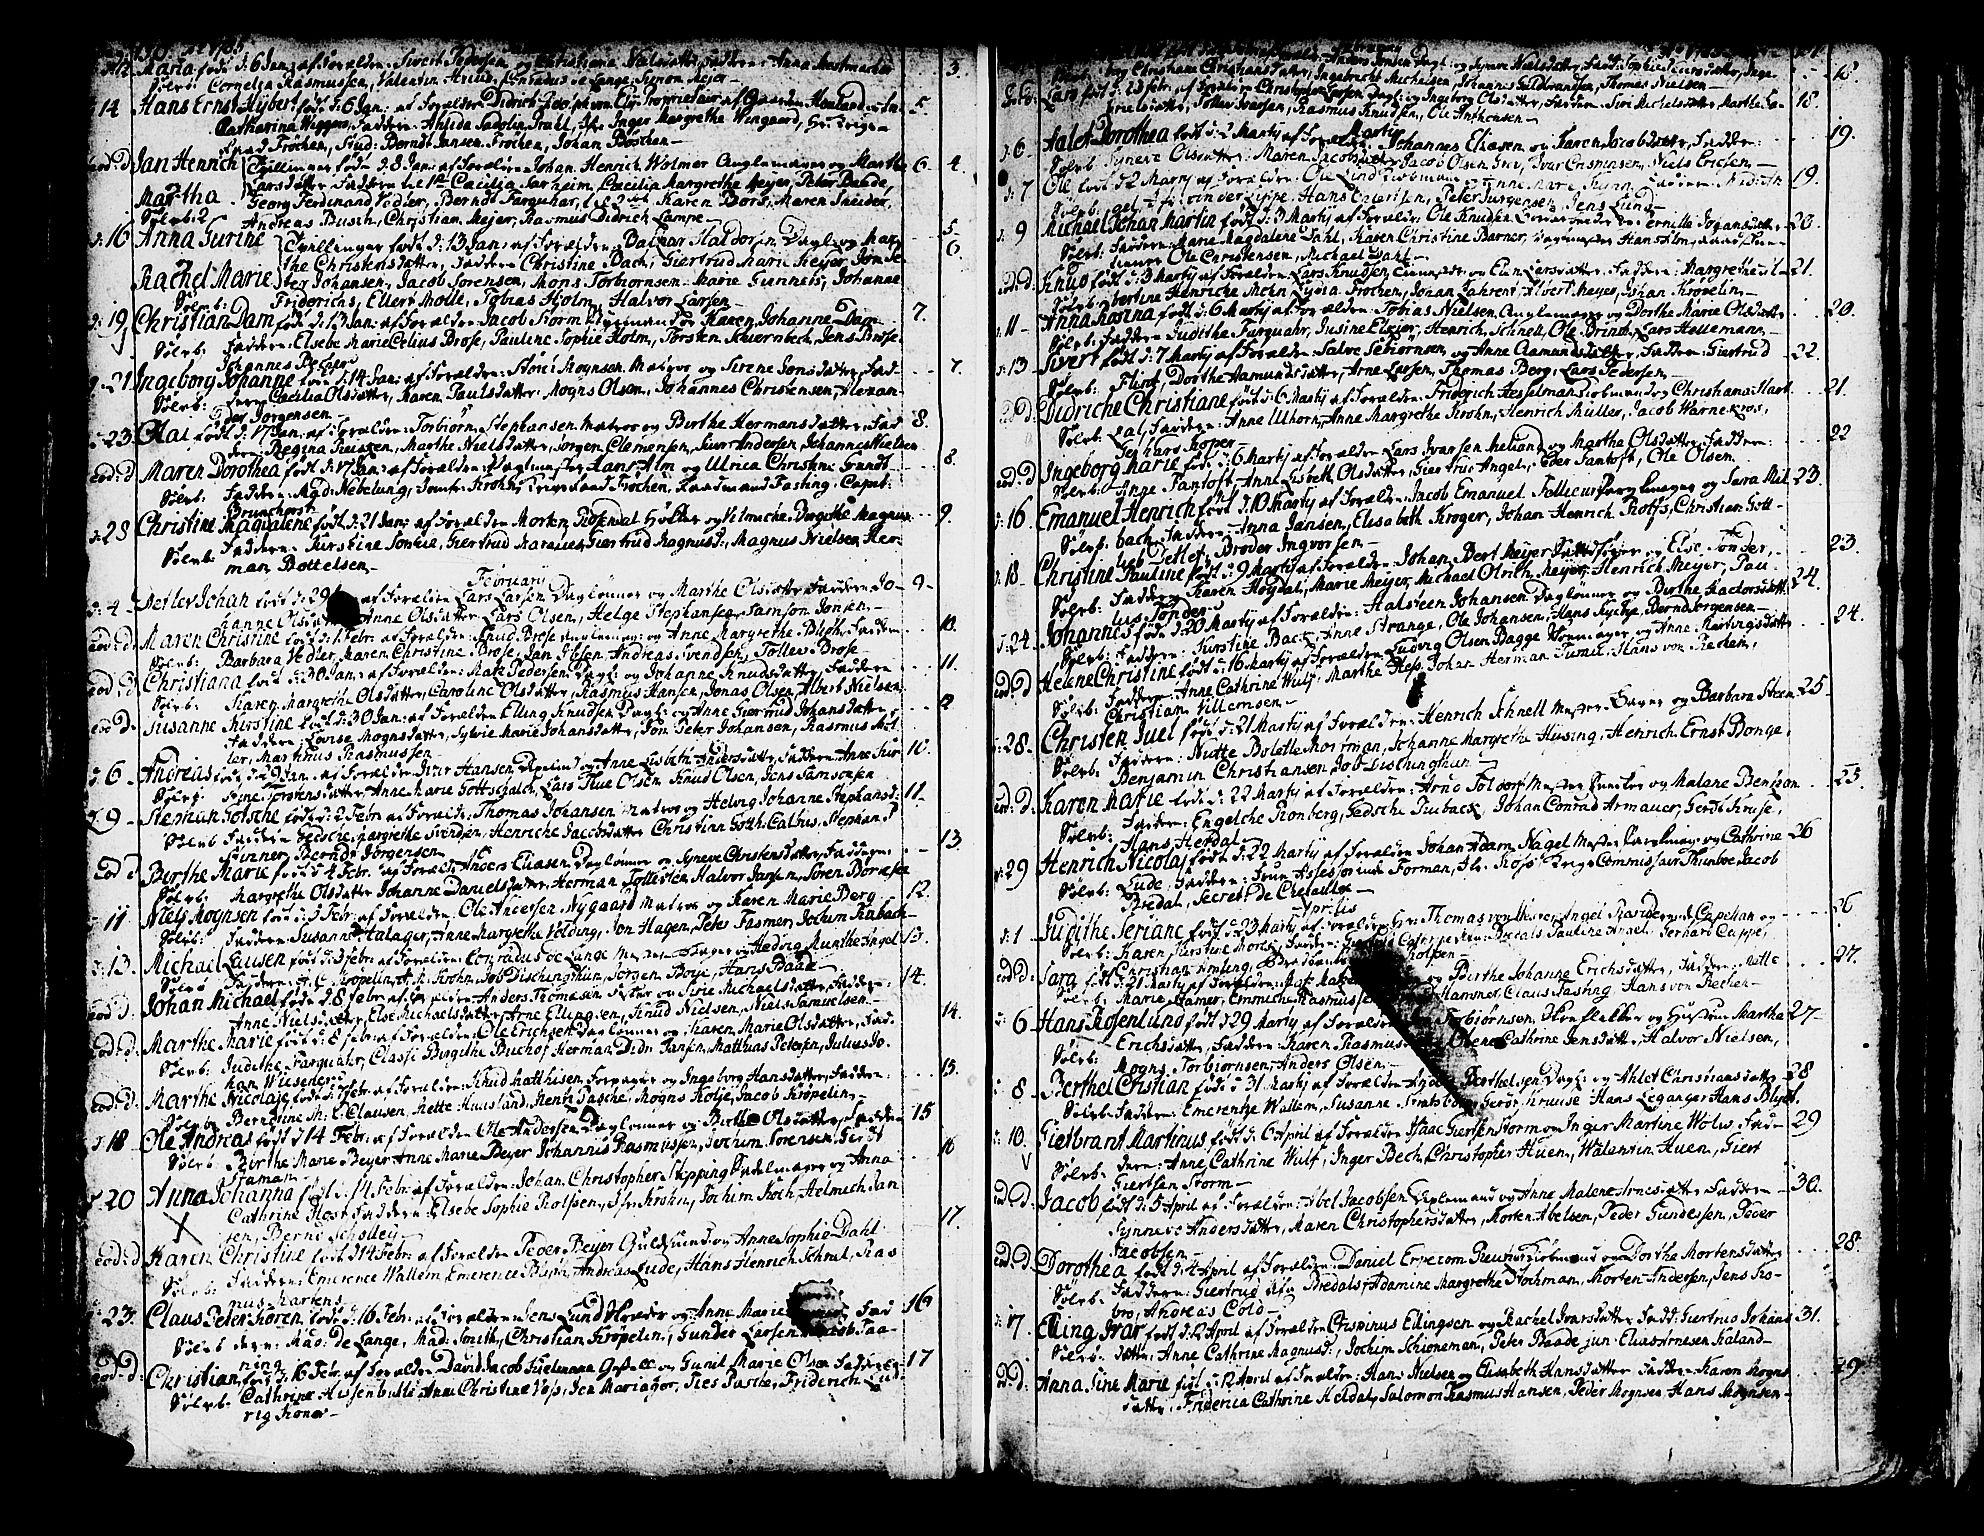 SAB, Domkirken Sokneprestembete, H/Haa/L0003: Ministerialbok nr. A 3, 1758-1789, s. 250-251